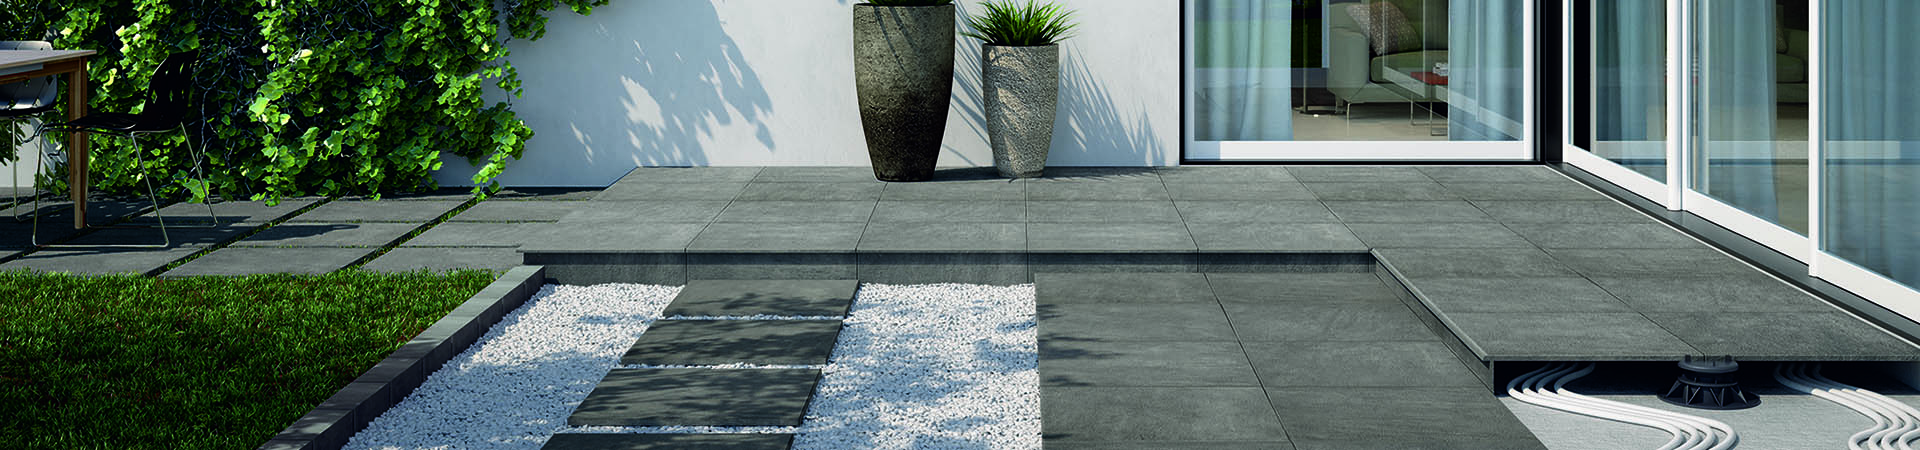 Lemmens Tegels | Keramische tegels - tuin & terras